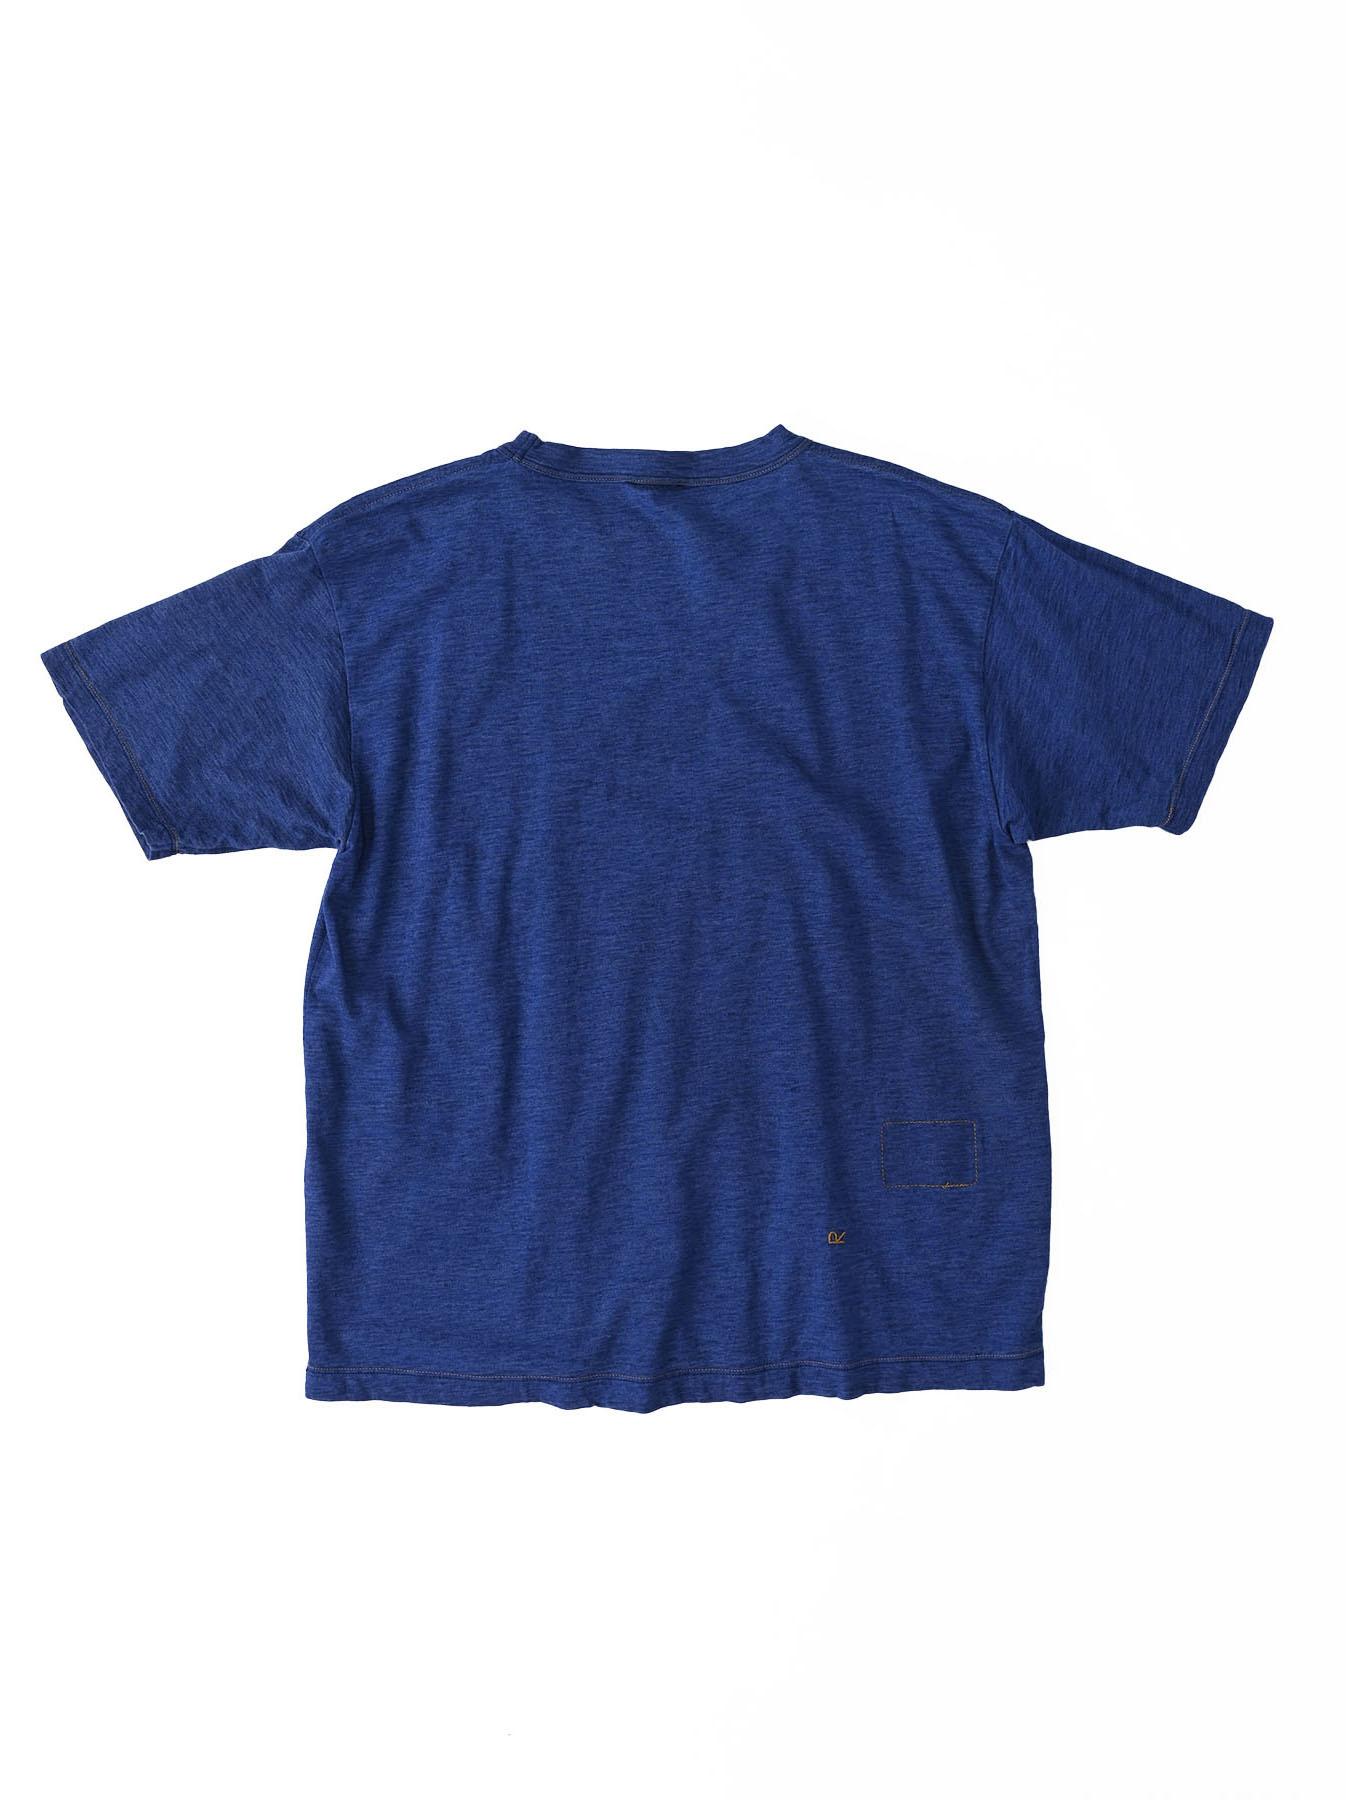 Distressed Indigo Ukiyo de Surf 908 Ocean T-shirt (0621)-6